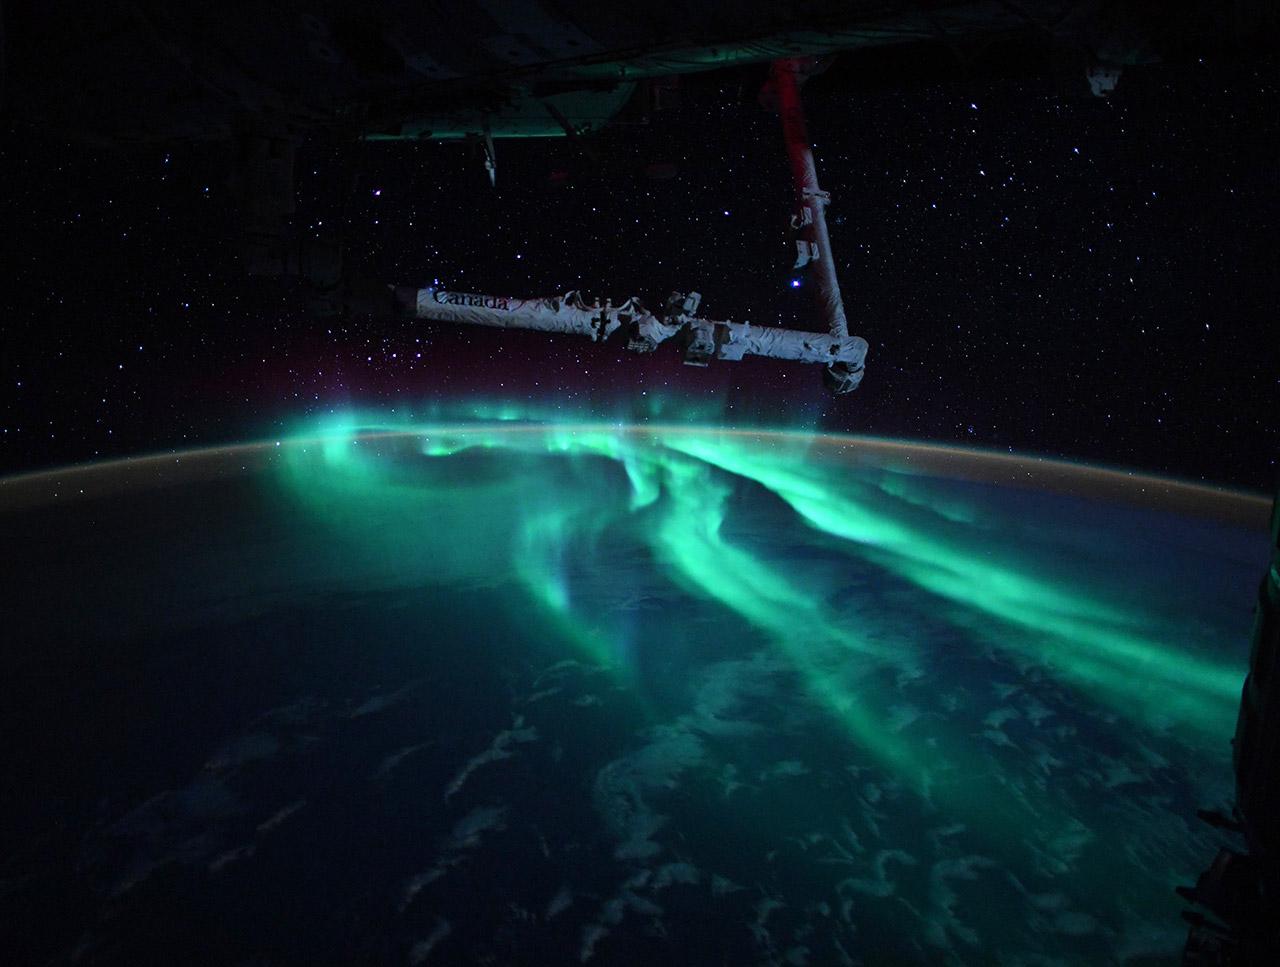 NASA Astronaut Thomas Pesquet International Space Station